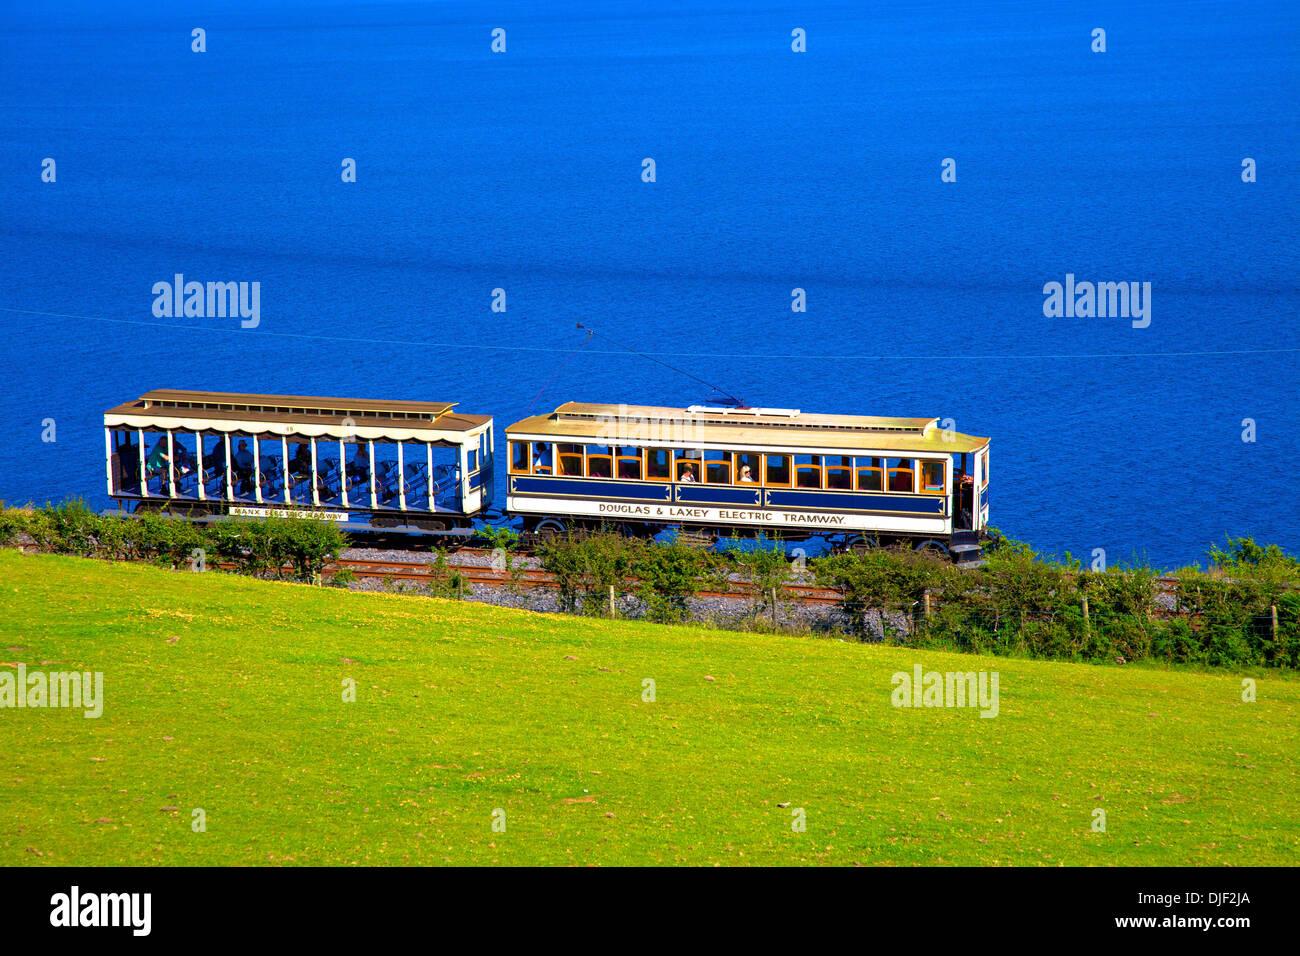 Manx Electric Railway, Isle of Man - Stock Image